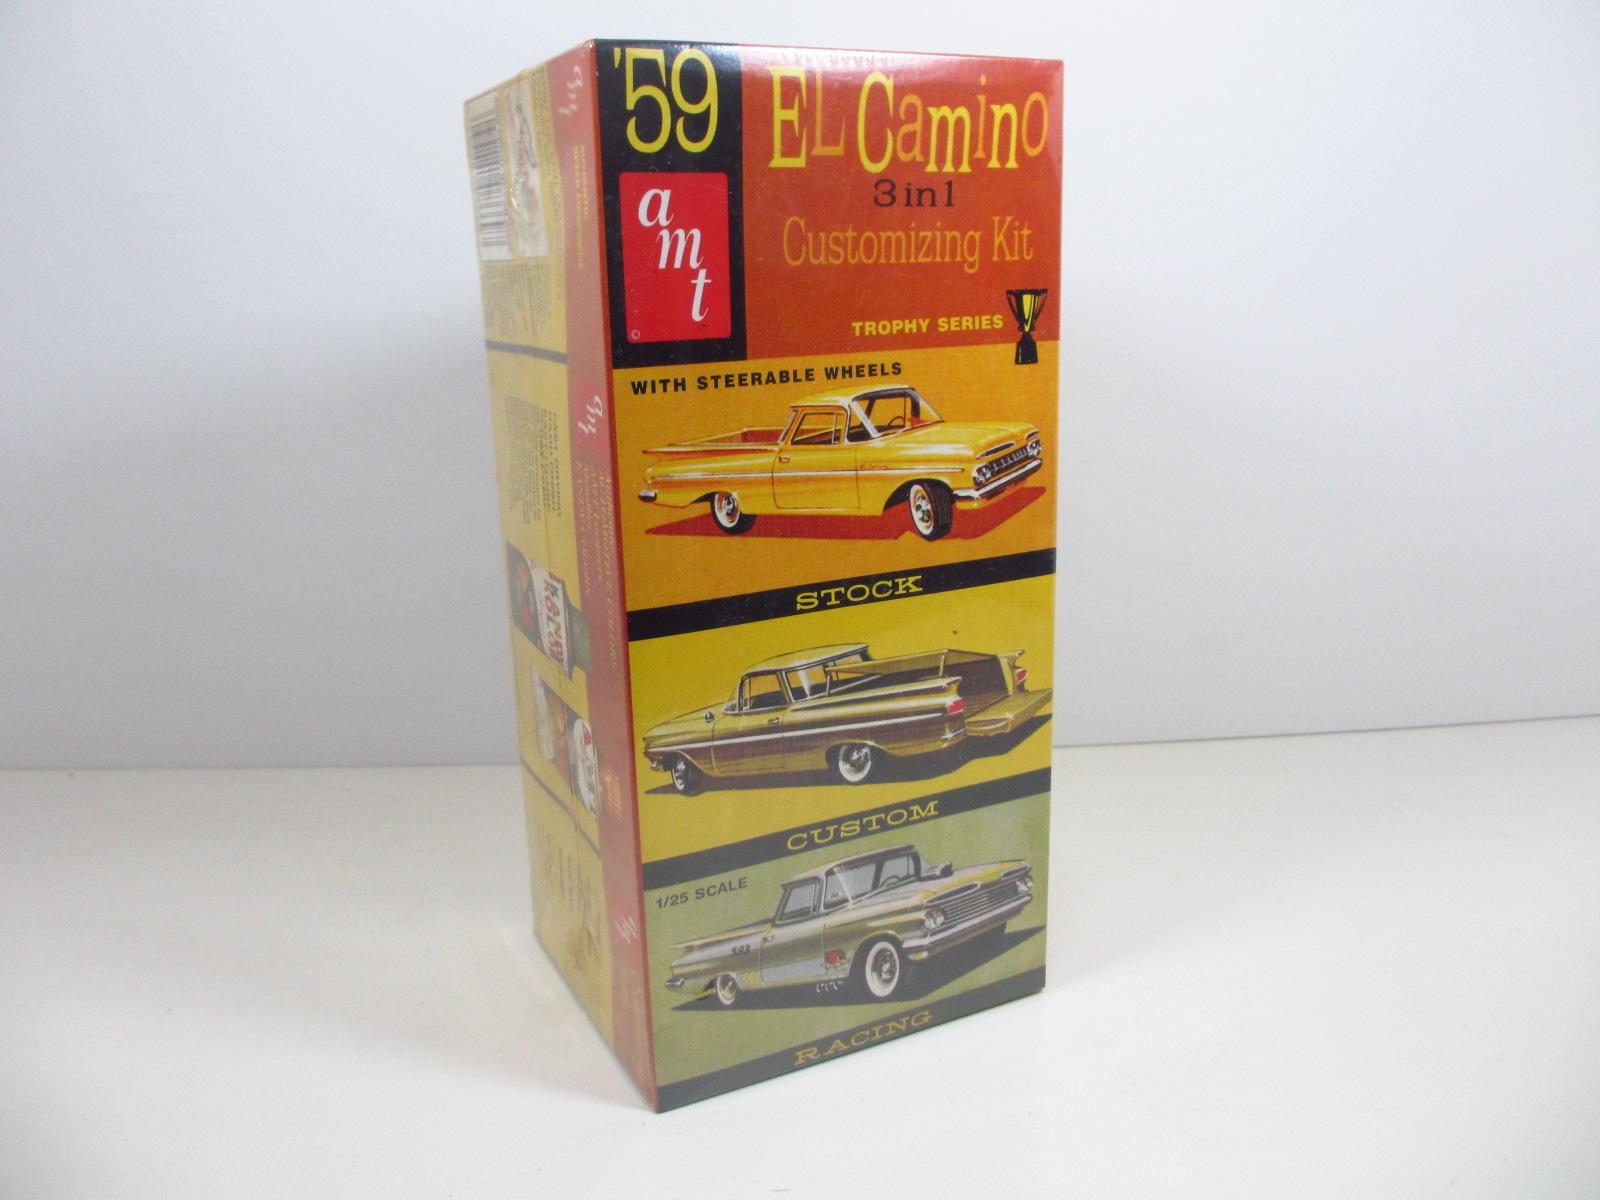 AMT  1/25  1959 Chevy EL camino エルカミ エルカミーノ k-36